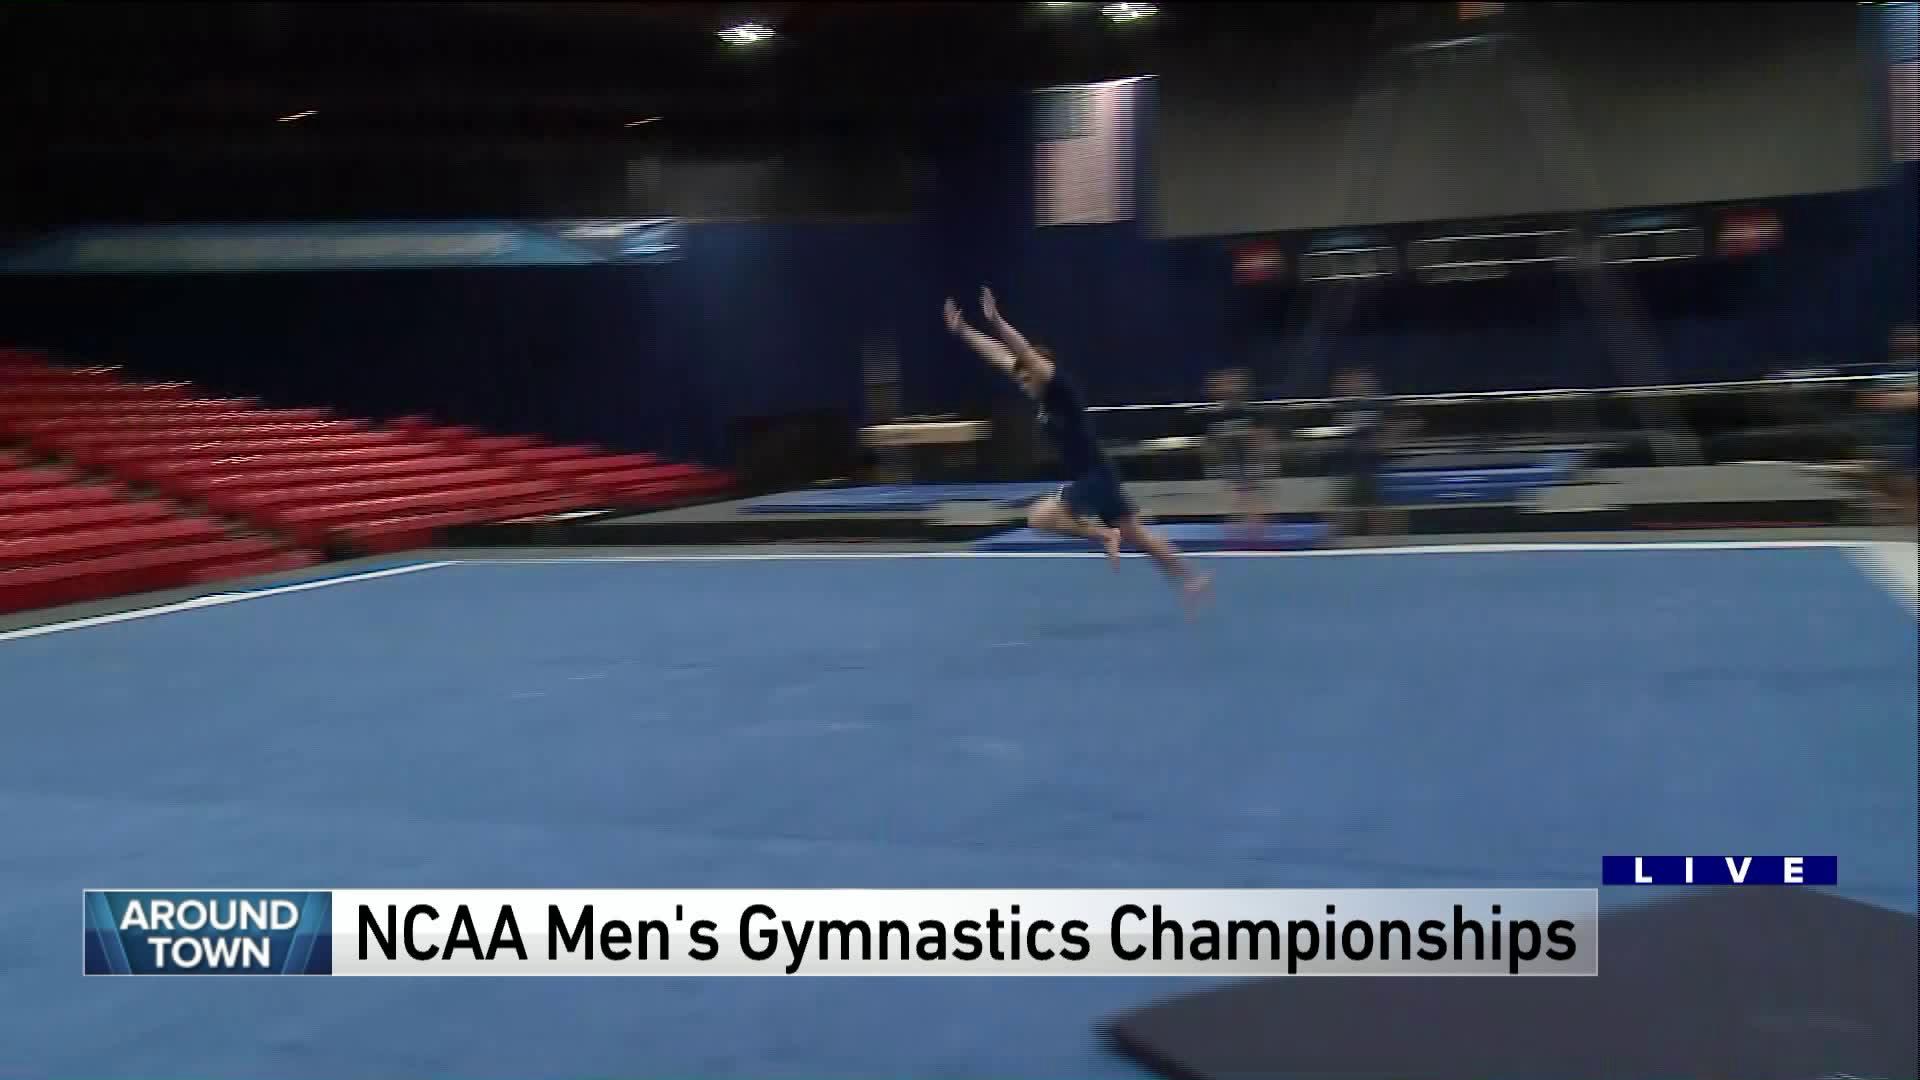 Around Town previews the NCAA Men's Gymnastics Championship